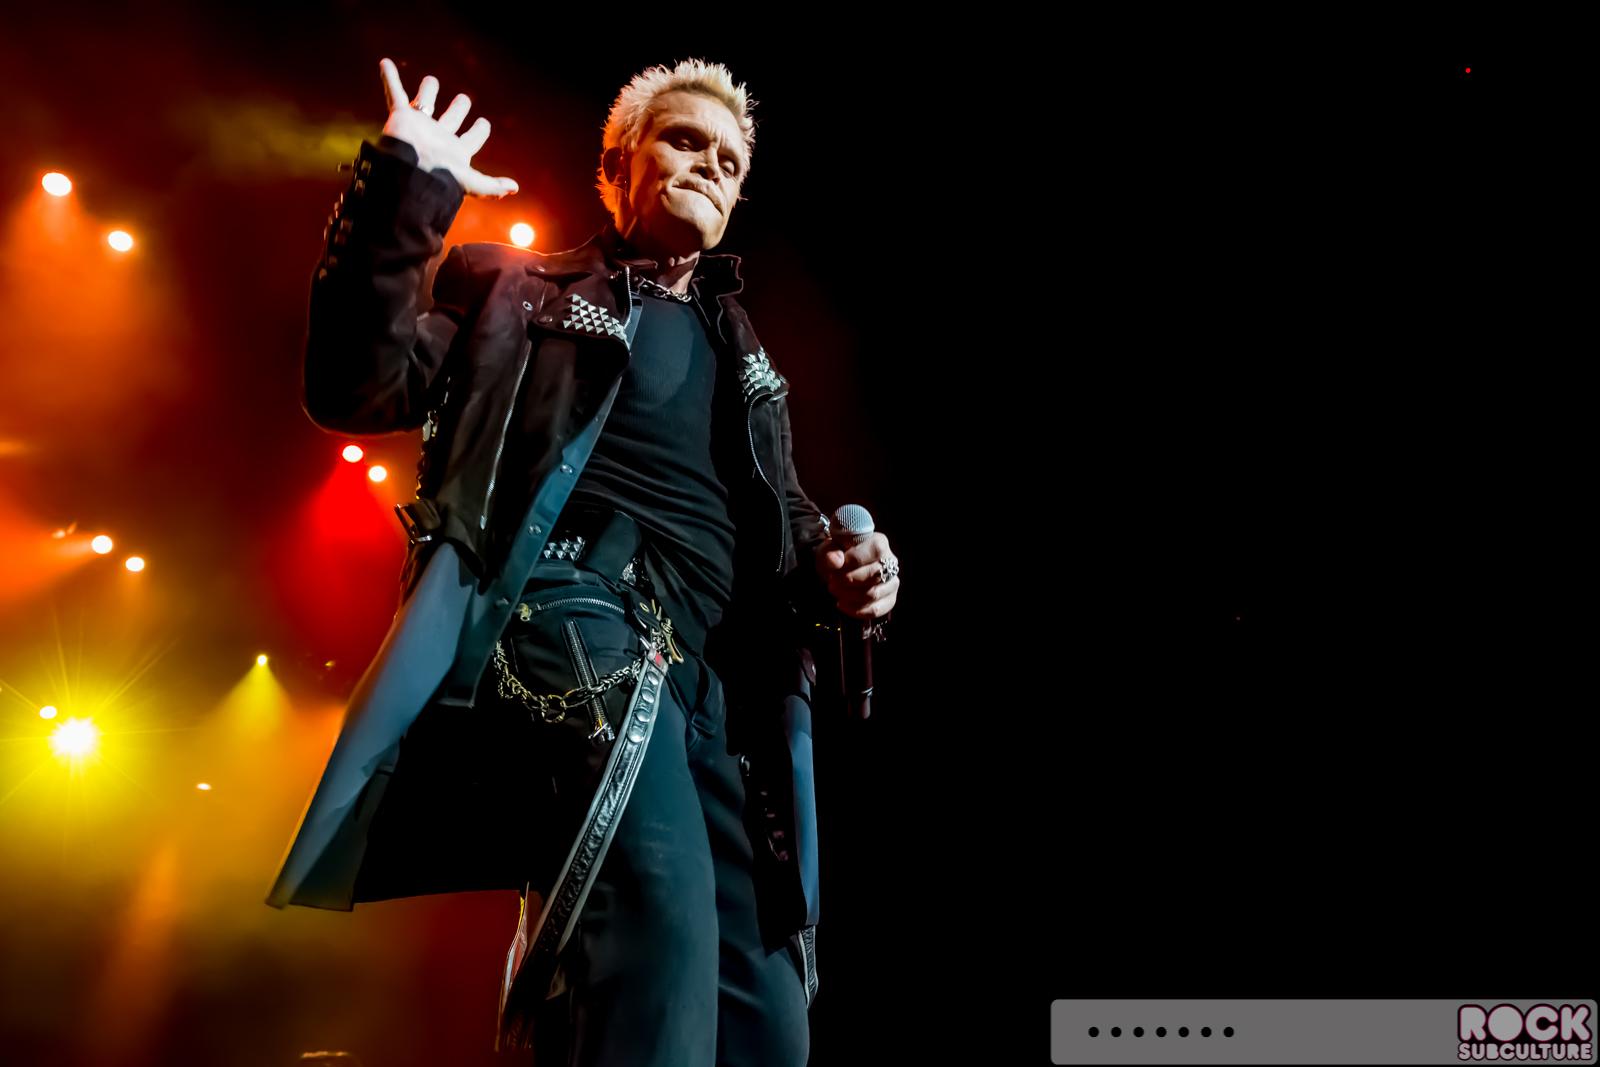 Billy idol at the grand theatre at grand sierra resort reno jason debord filed under billy idol m4hsunfo